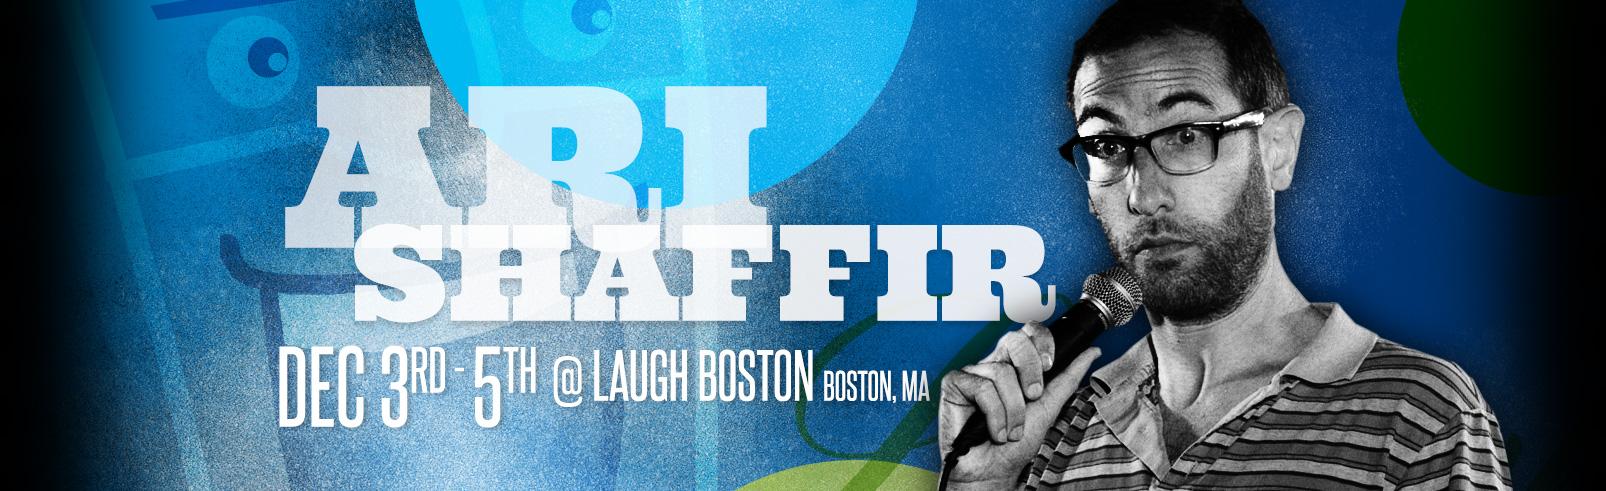 Ari Shaffir @ Laugh Boston